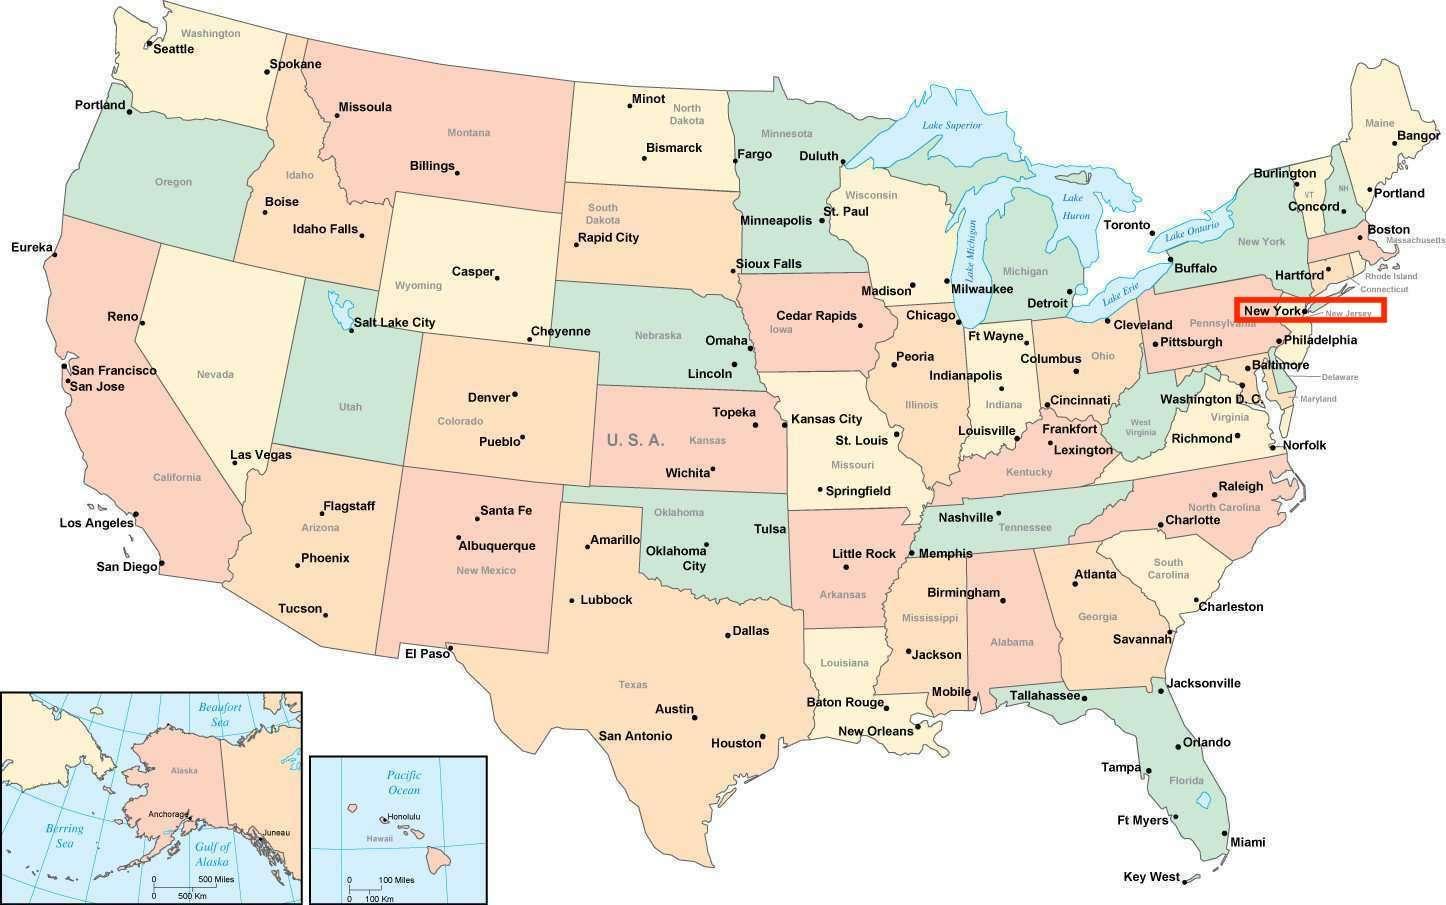 Amerika Karte New York.New York Amerikas Karti ņujorka Amerikas Kartē New York Asv